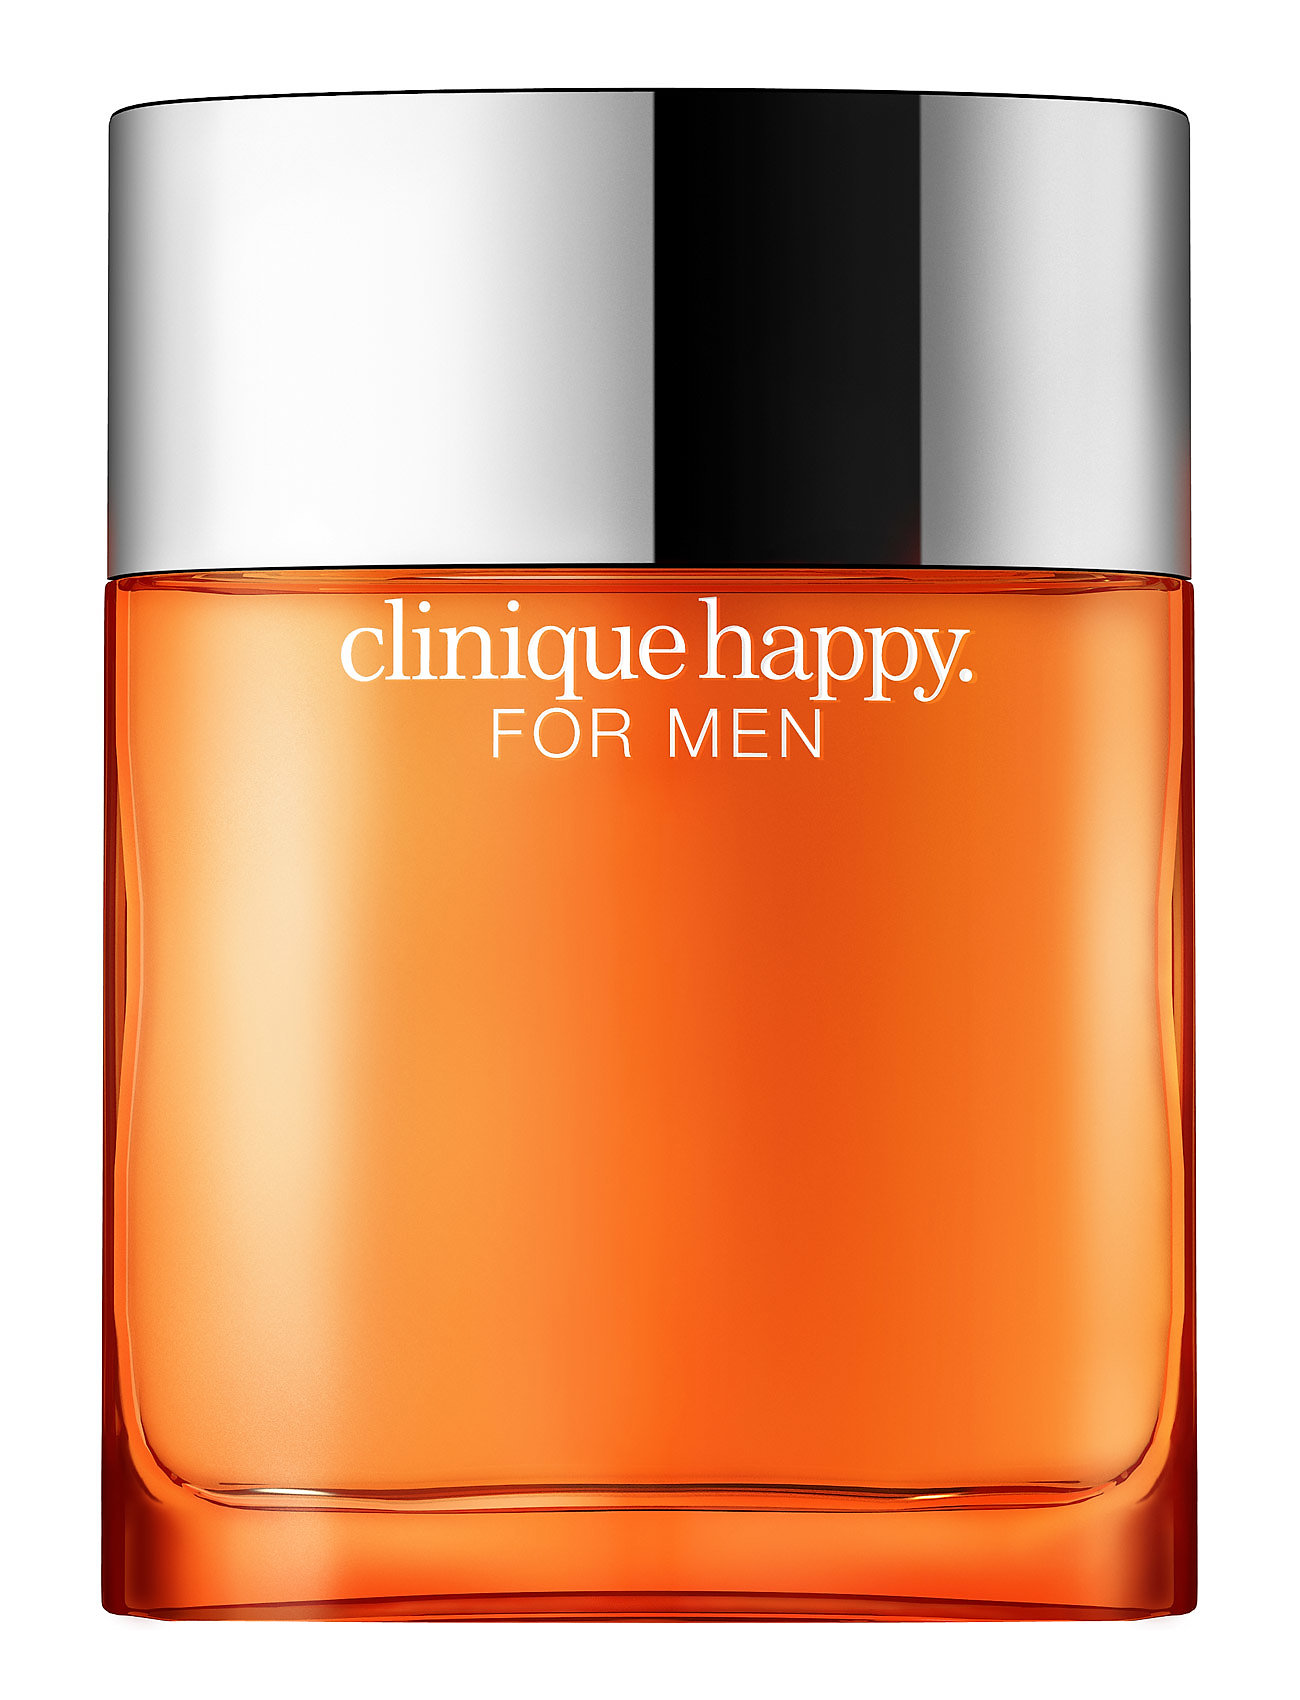 Clinique Clinique Happy. For Men Cologne Spray - CLEAR